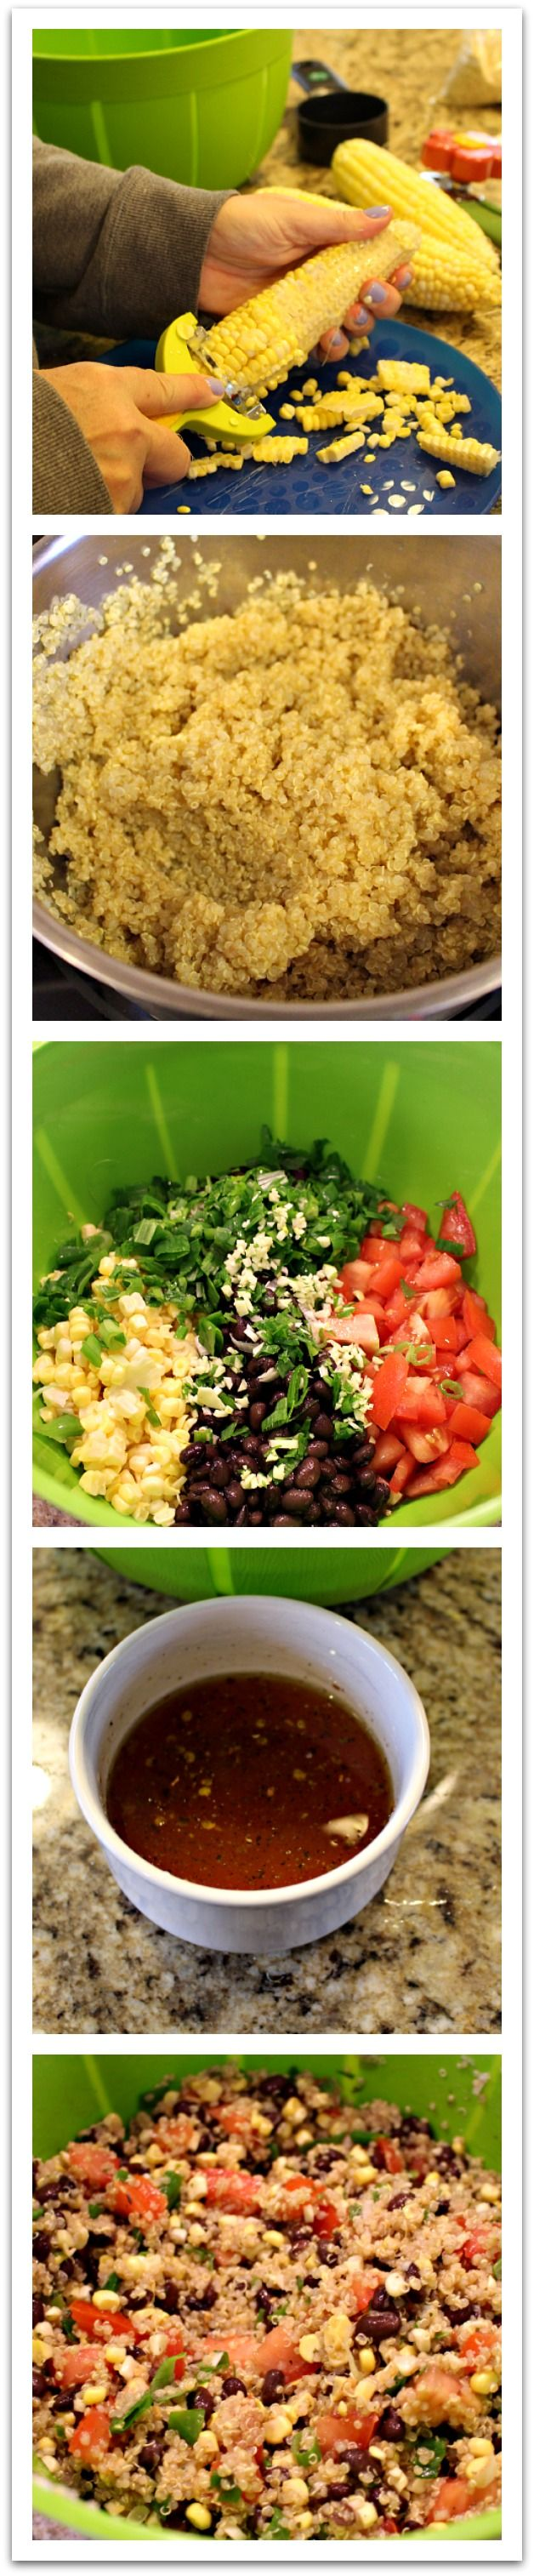 zesty sweet corn and quinoa salad